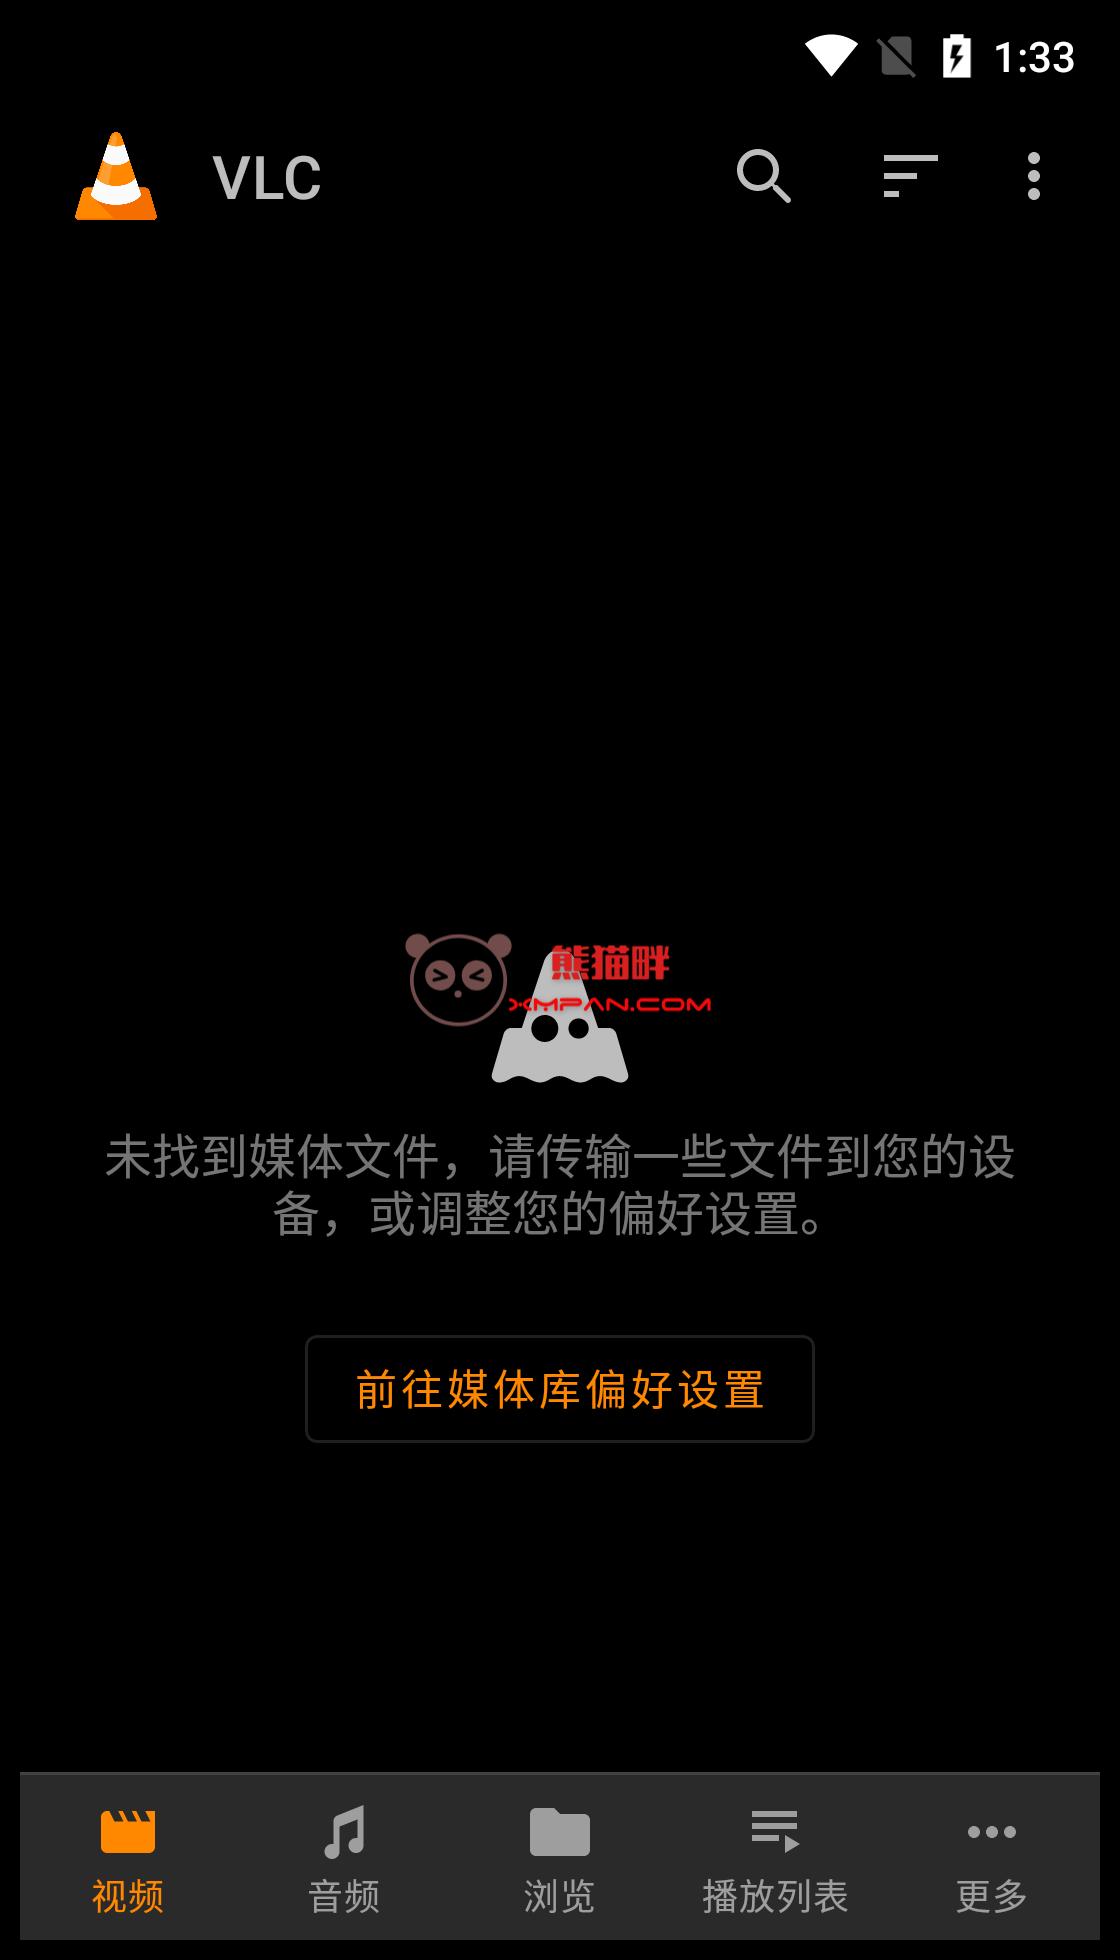 Screenshot_20211013-013325.png